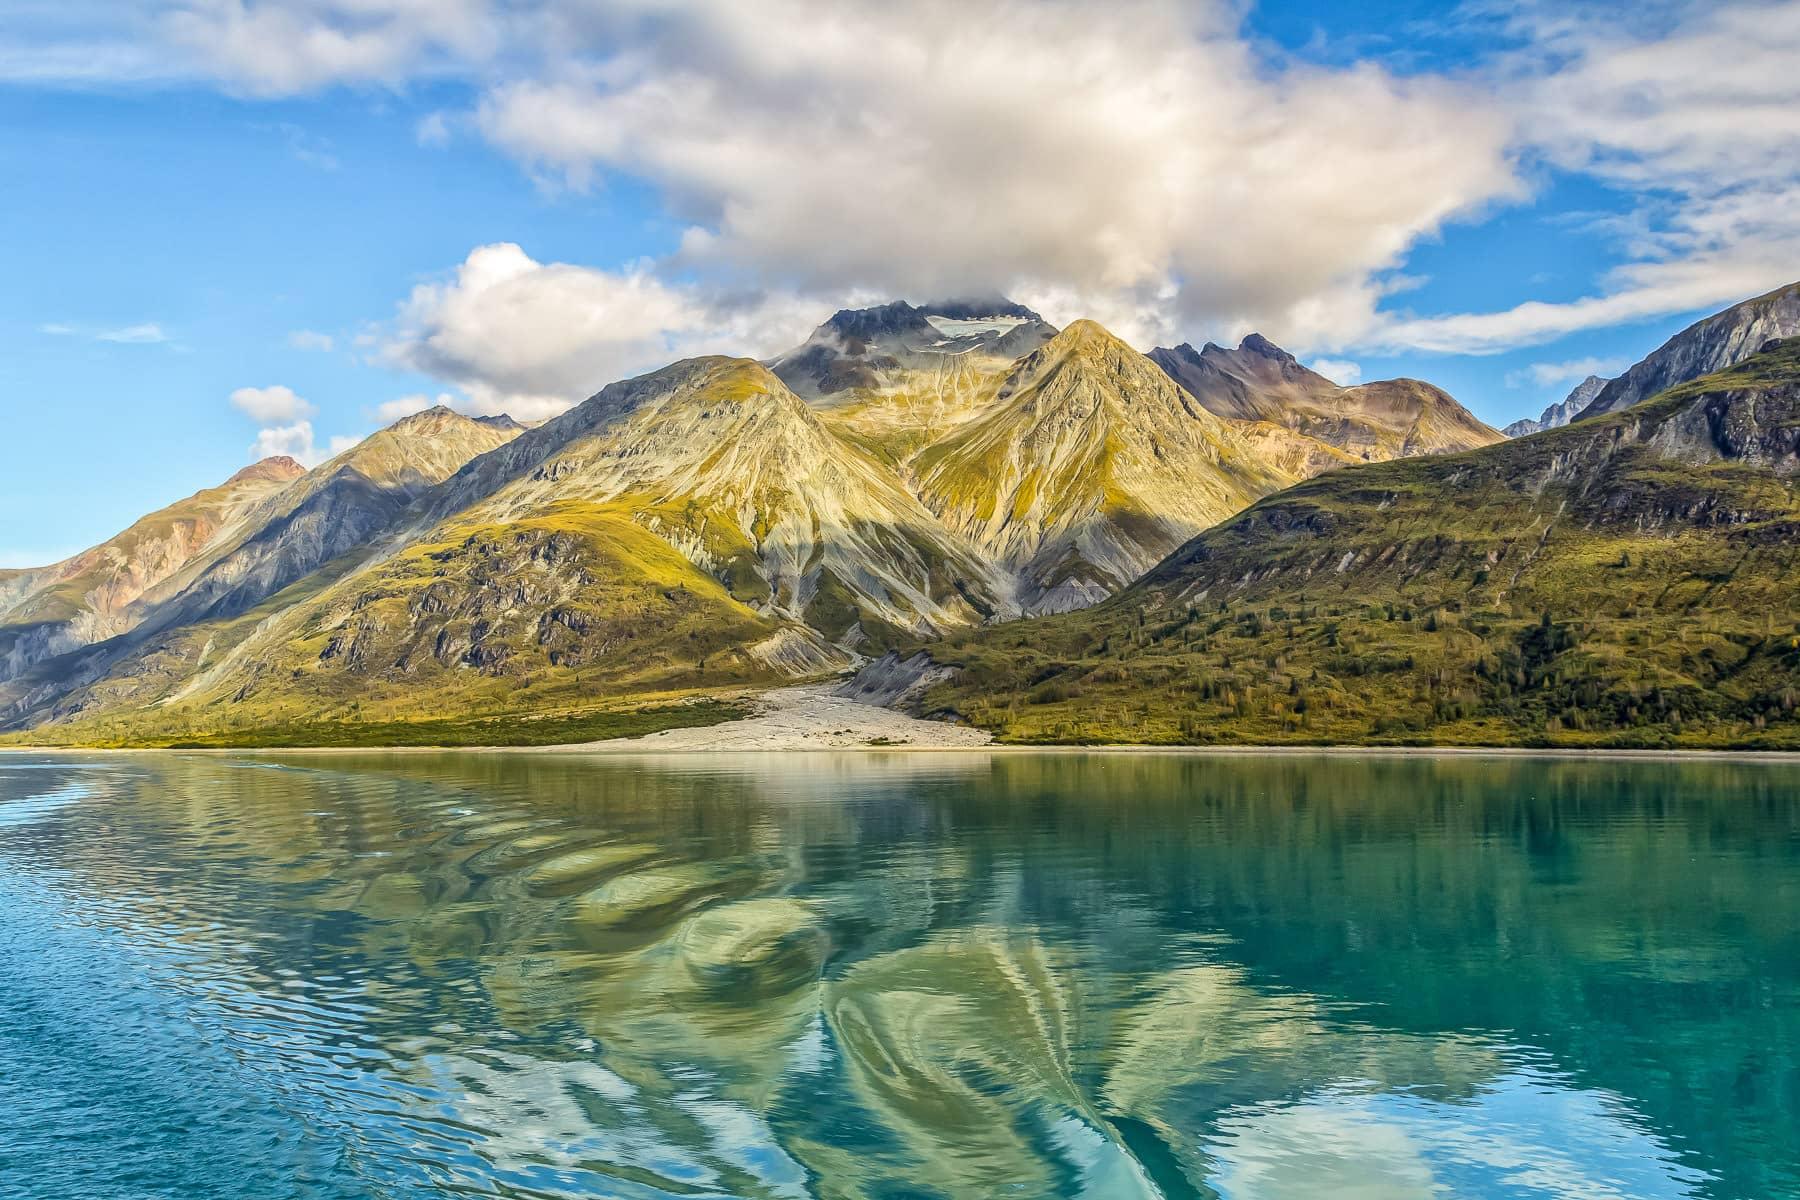 A cloud envelops a small, glacier-topped mountain in Alaska's Glacier Bay National Park.